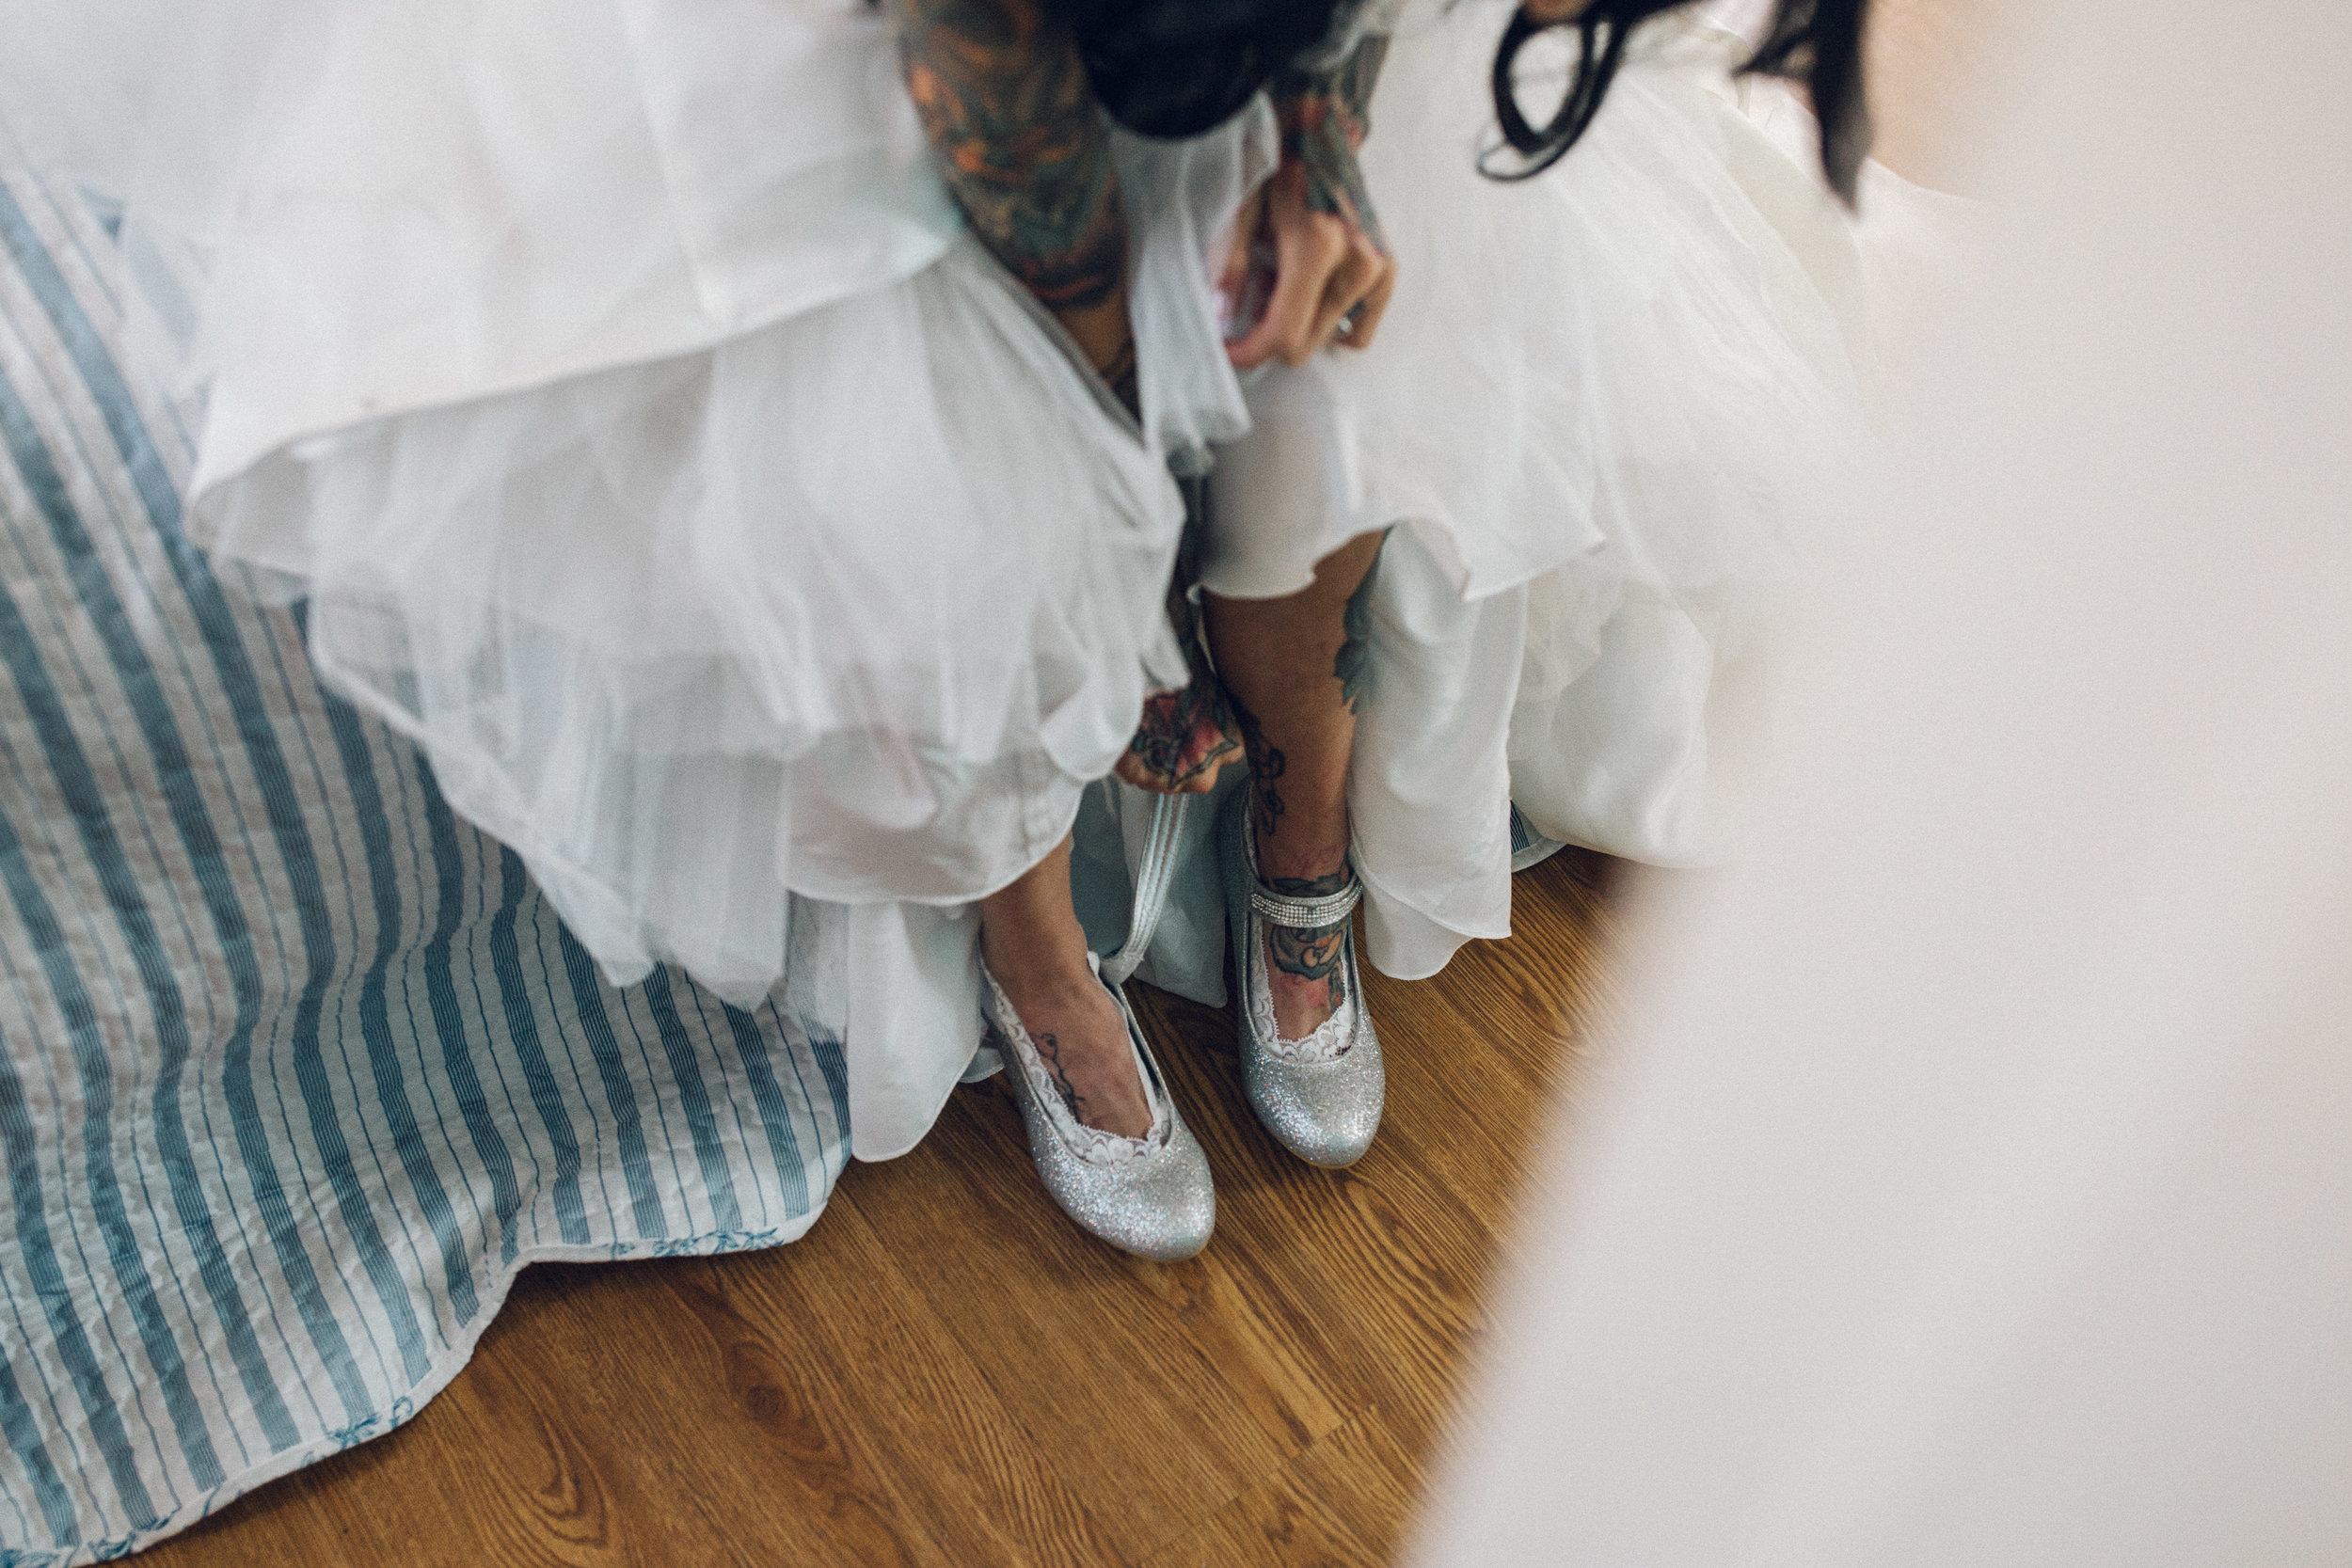 Heavily tattooed bride putting dress on